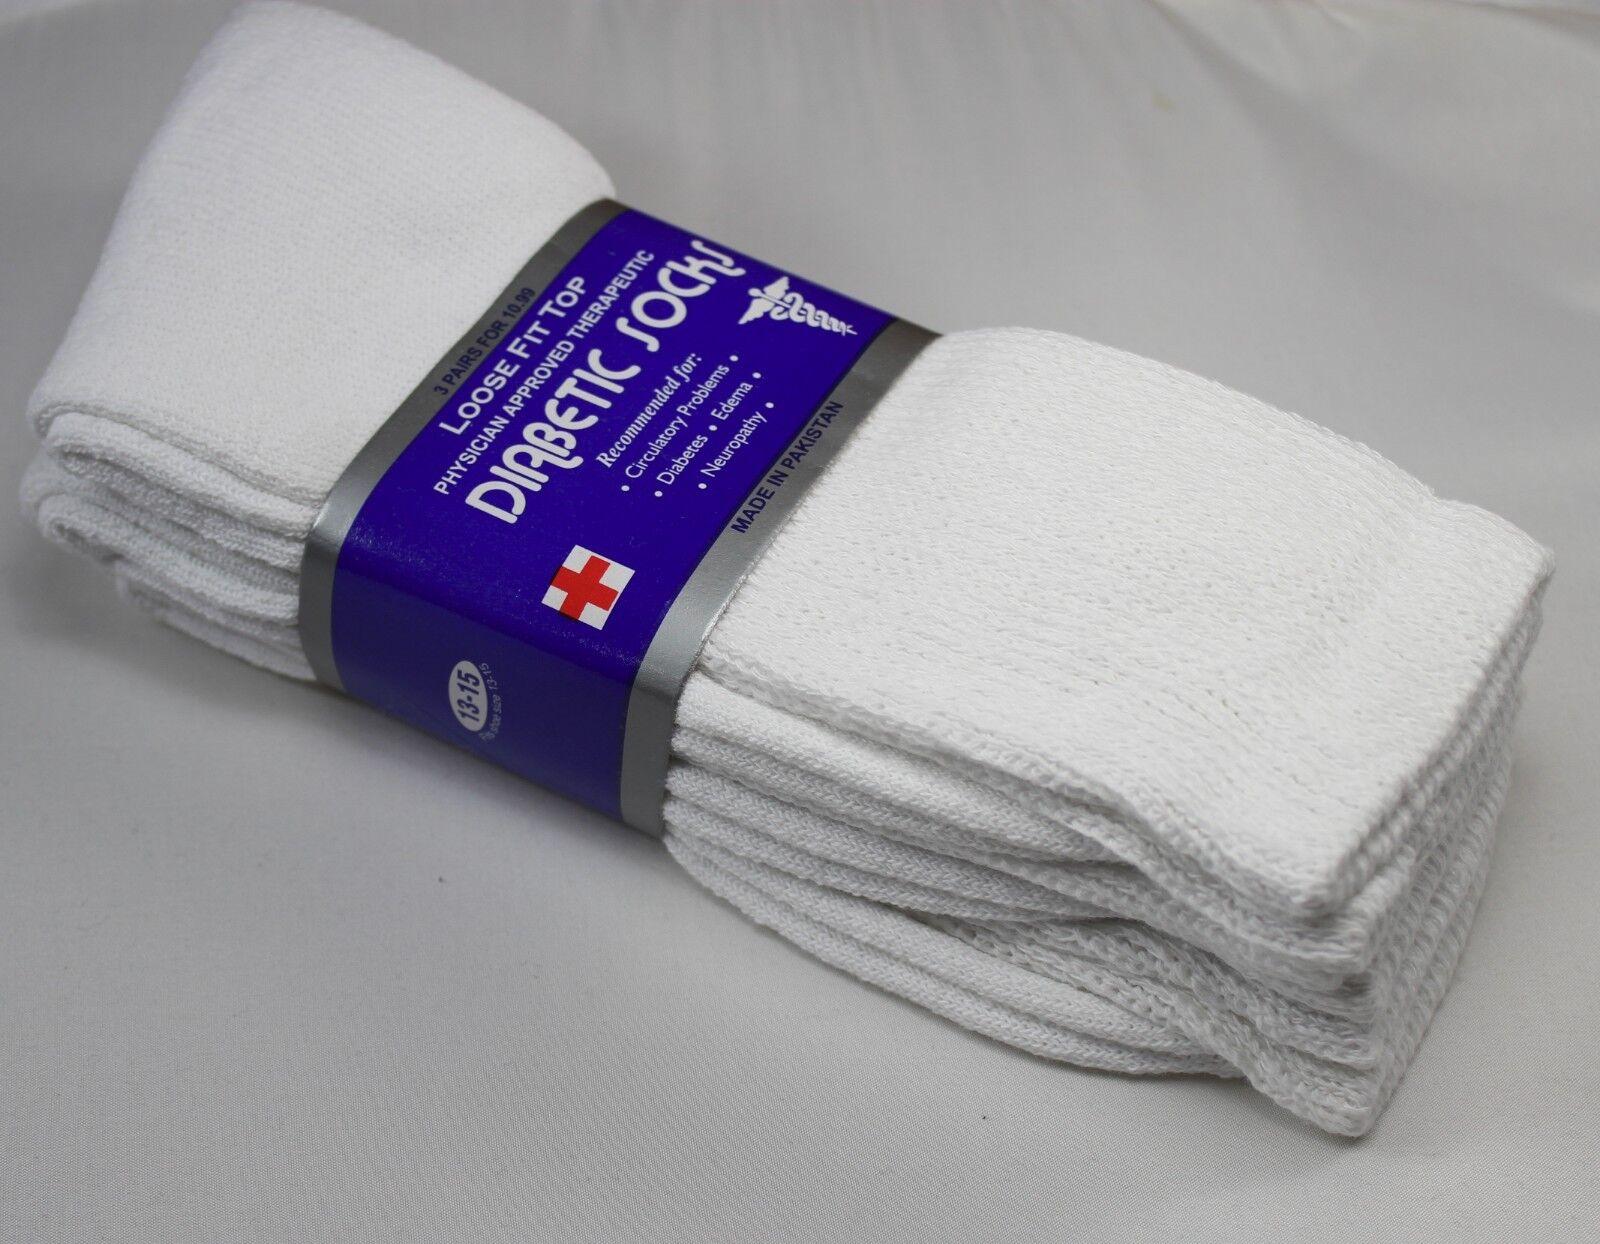 3,6 or 12 dozen Pairs Diabetic Crew Circulatory Socks Health Mens Cotton 9 10-15